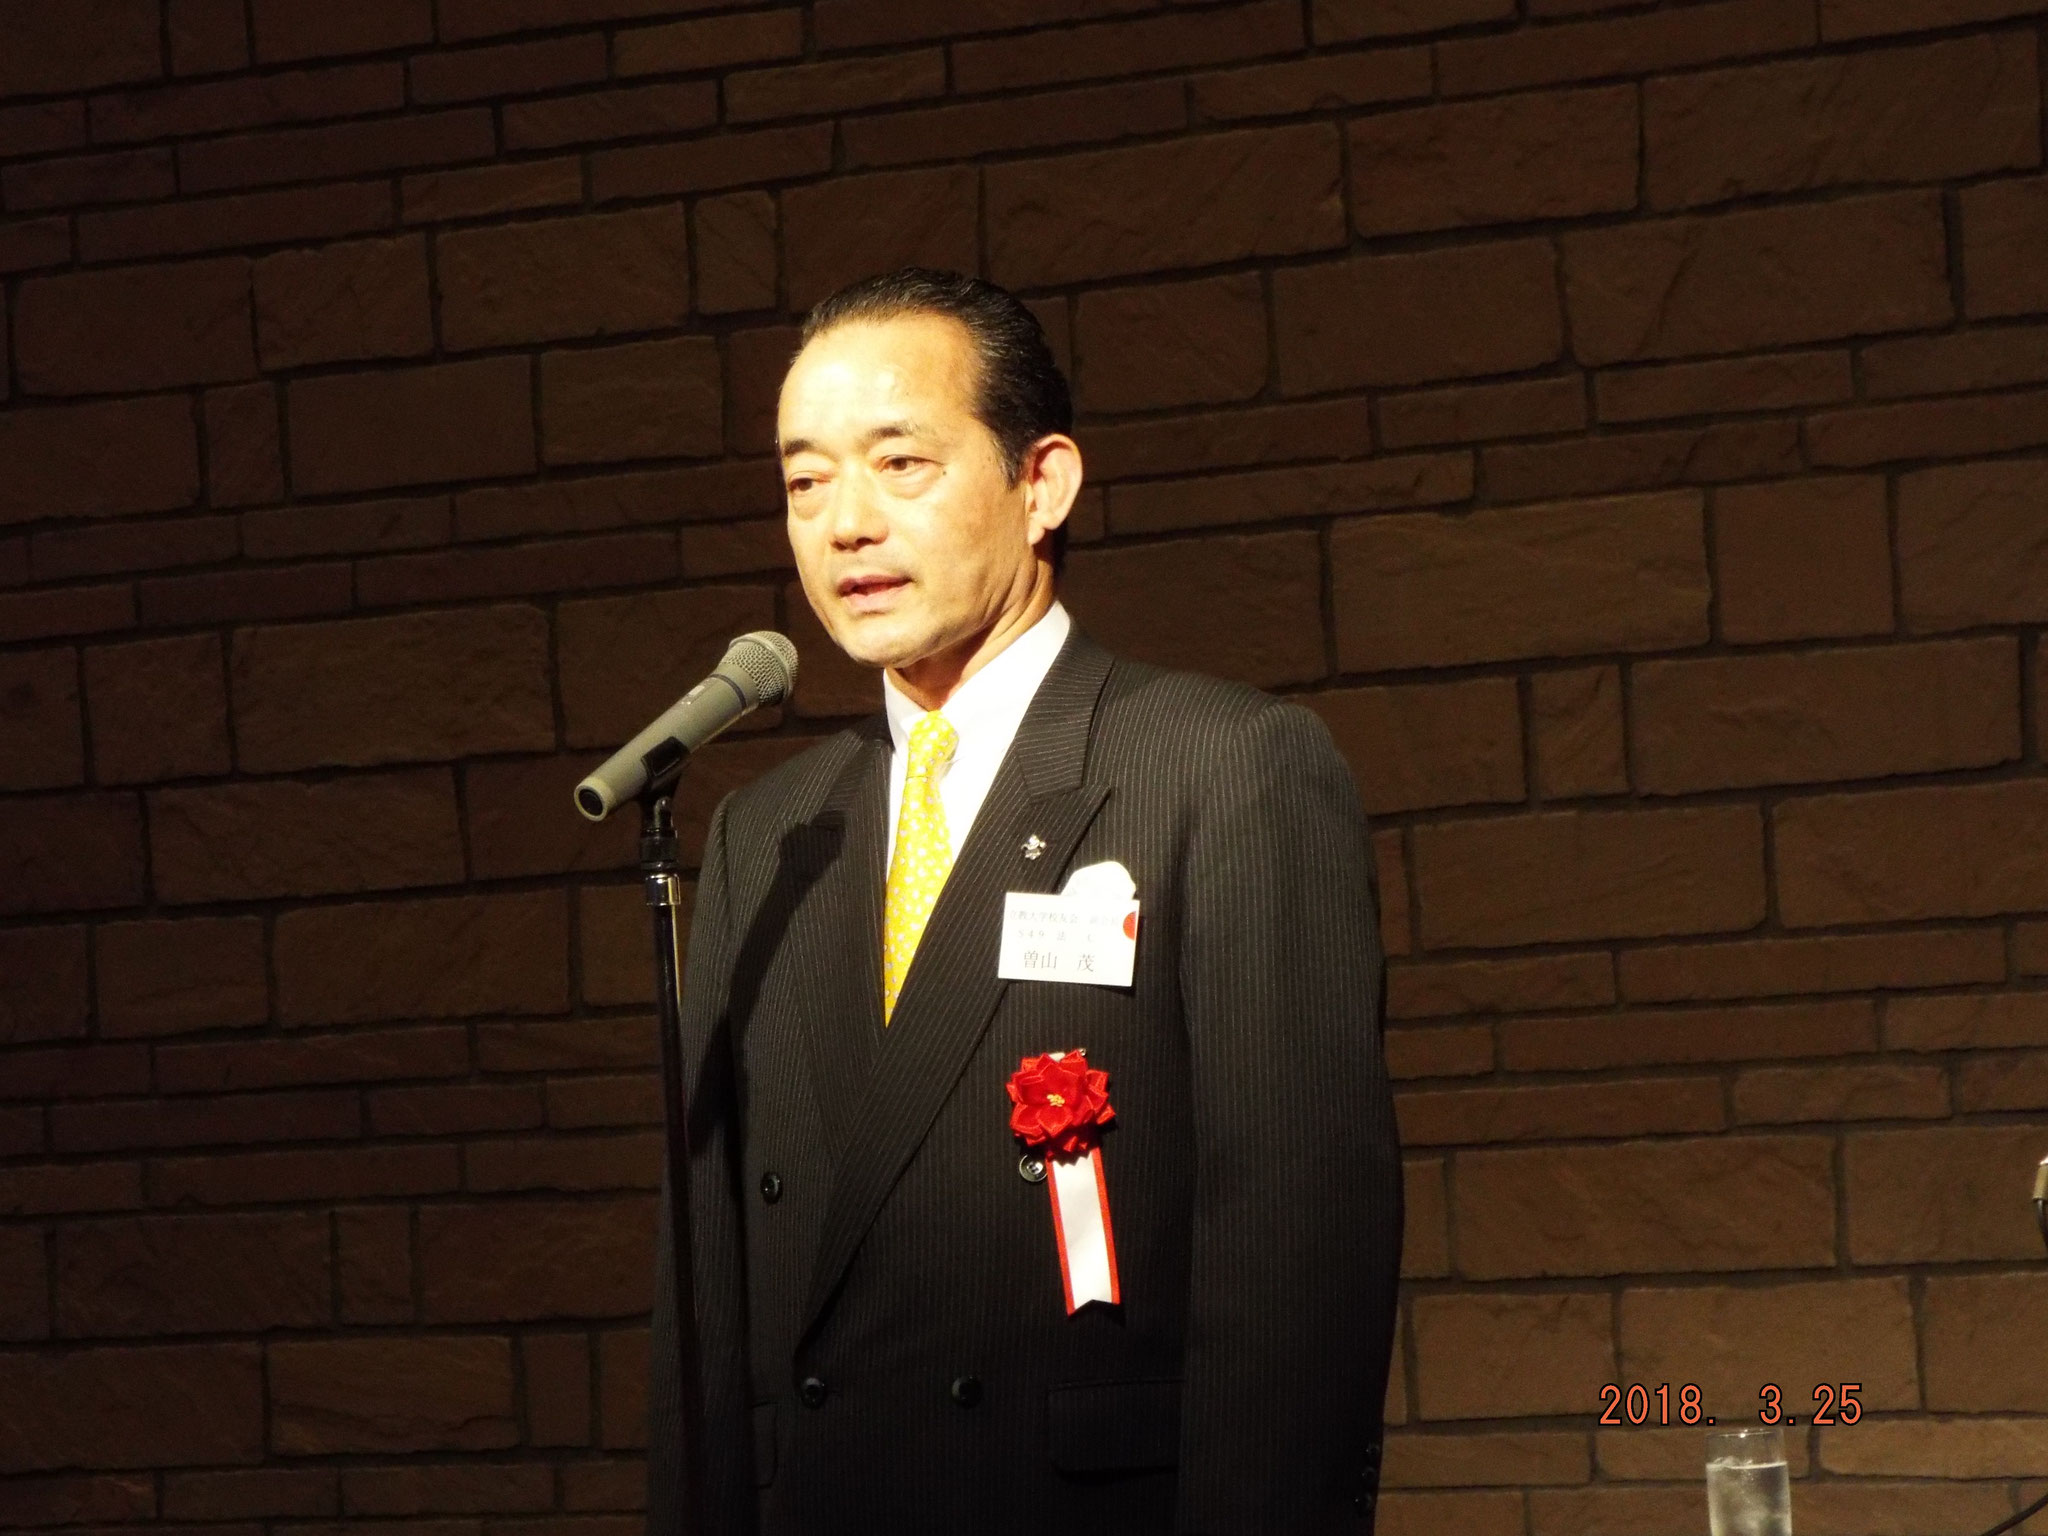 曽山校友会副会長から祝辞